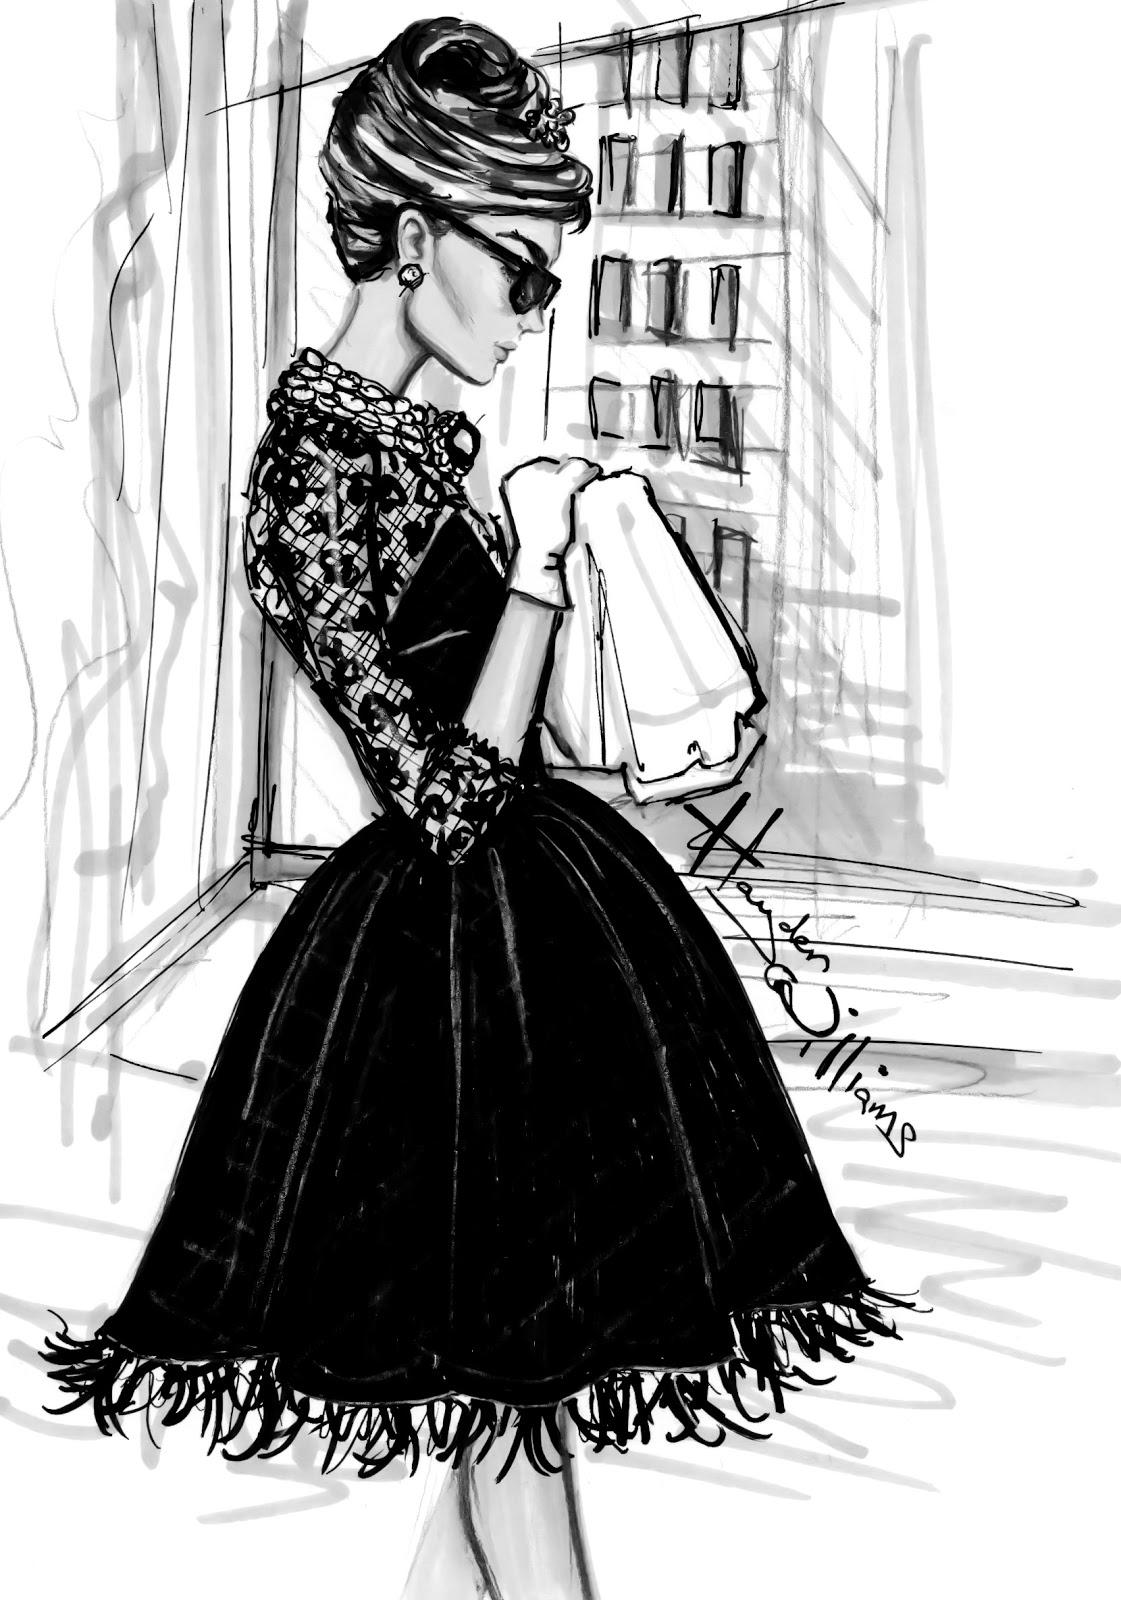 Fashion Illustration Royalty Free Stock Photo: Hayden Williams Fashion Illustrations: December 2012